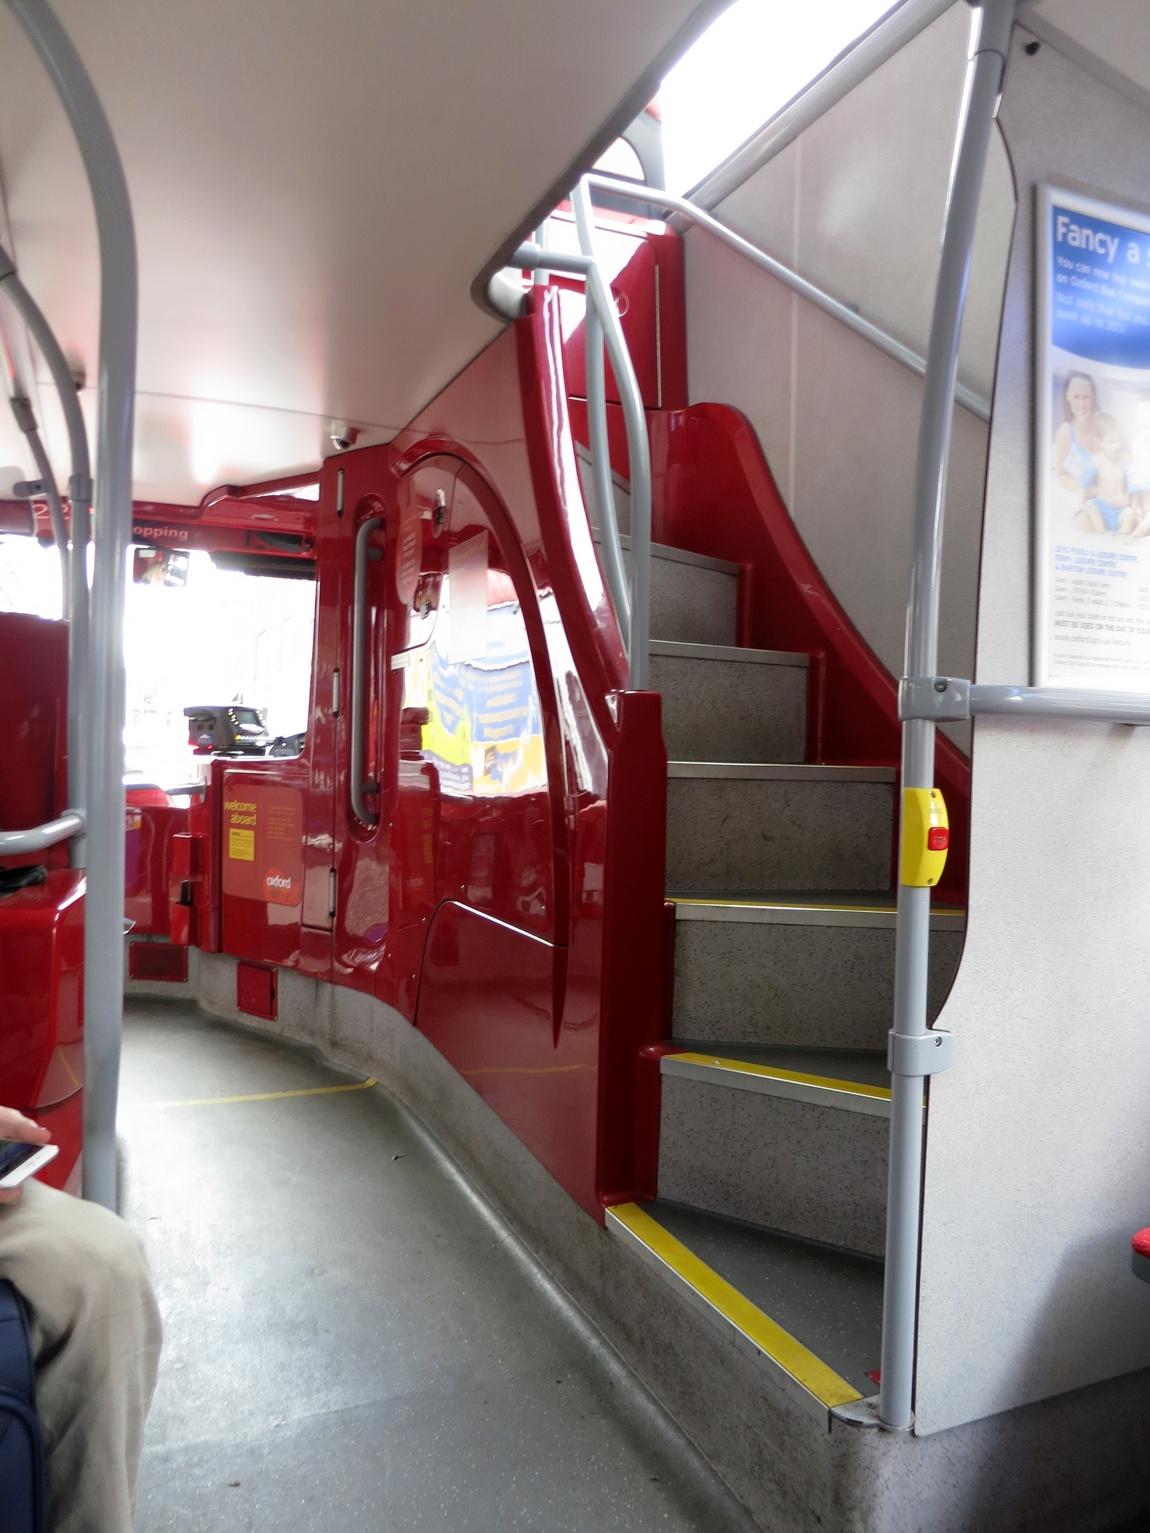 Лестница в двух ярусном автобусе (Англия)